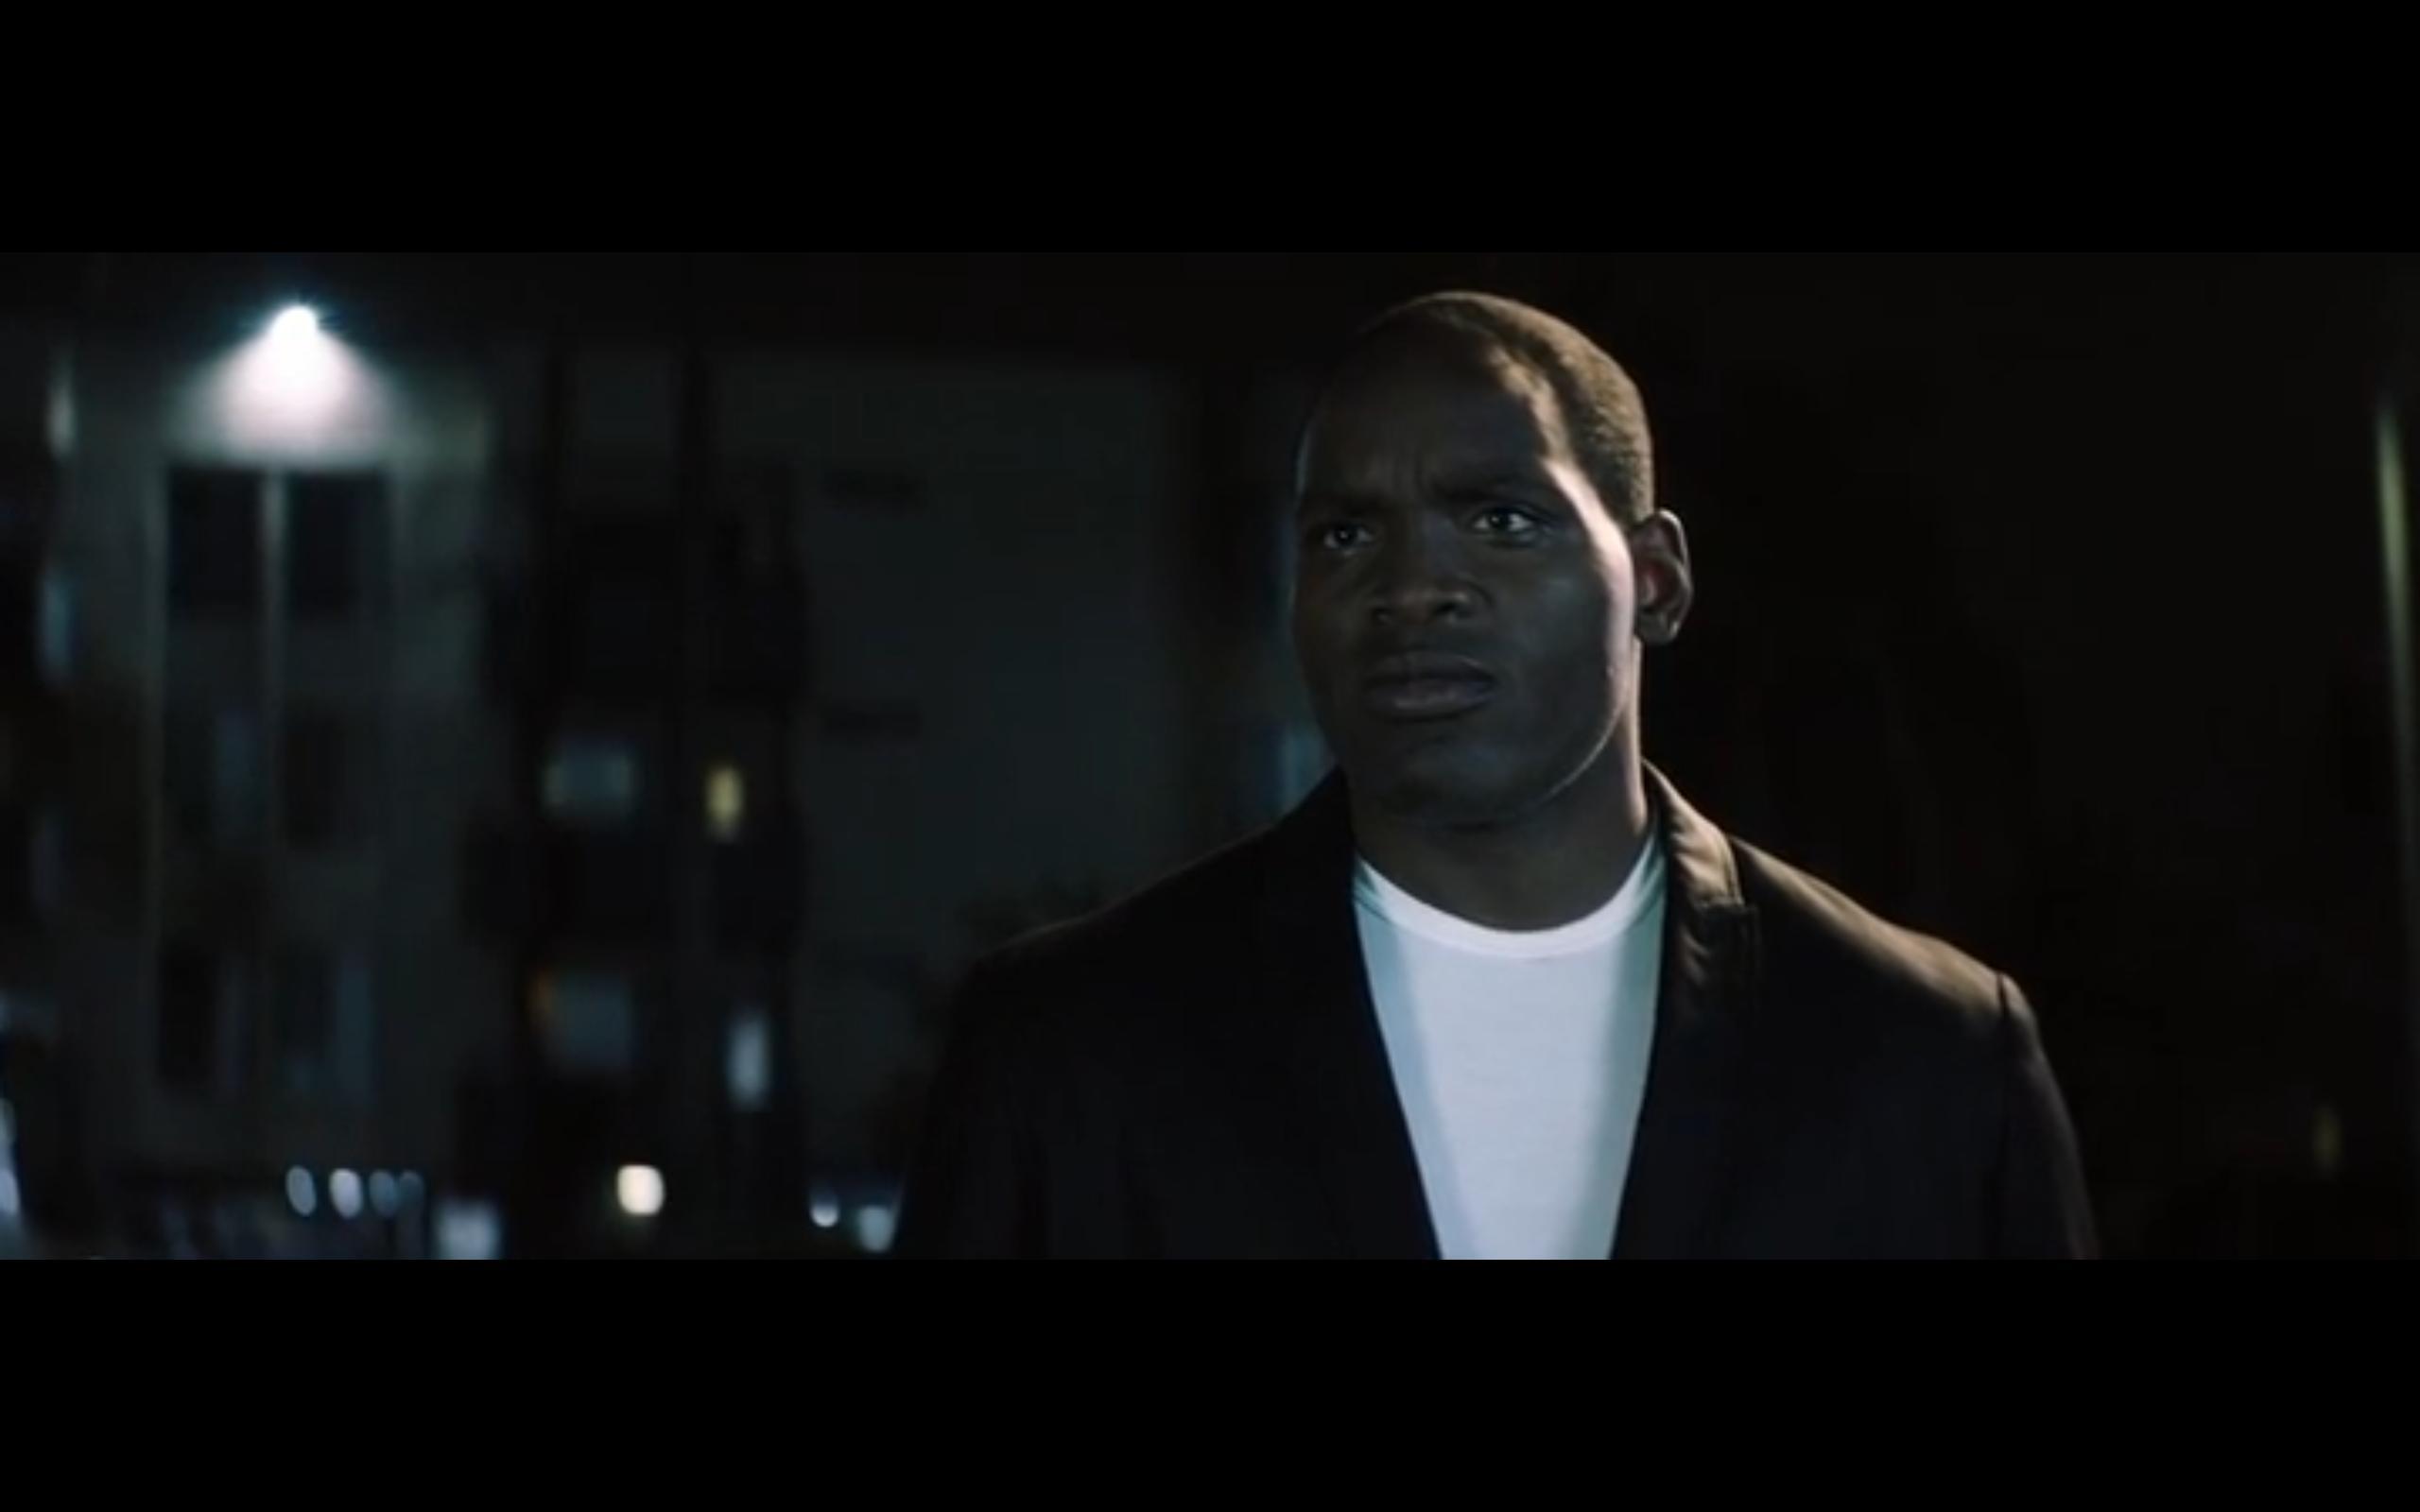 Gene Freeman as OJ Simpson on The murder of Nicole Brown